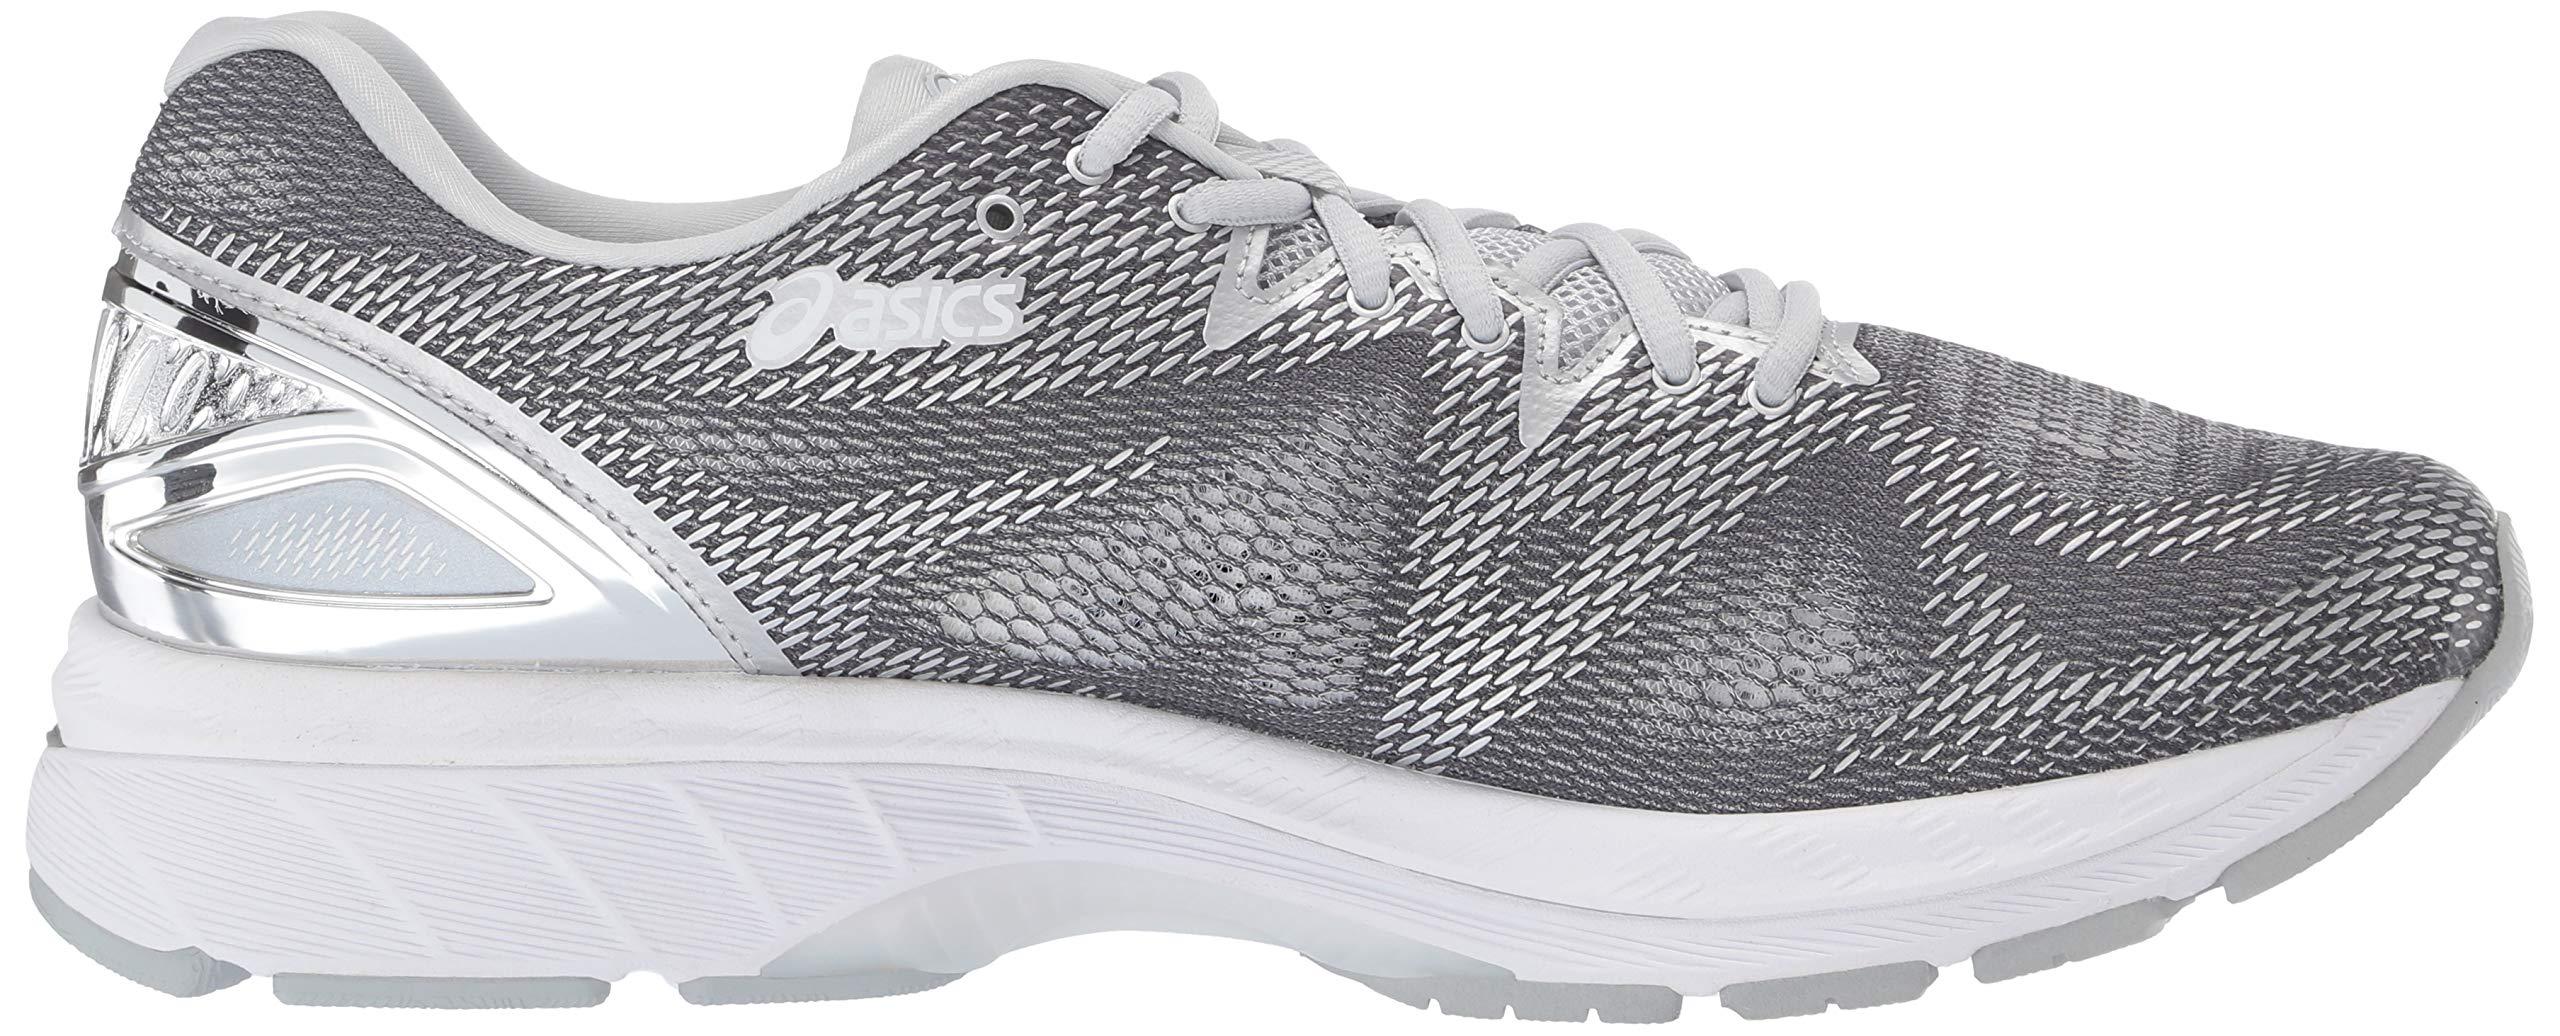 ASICS Mens Fitness/Cross-Training Trail Running Shoe, Carbon/Silver/White, 7 Medium US by ASICS (Image #6)